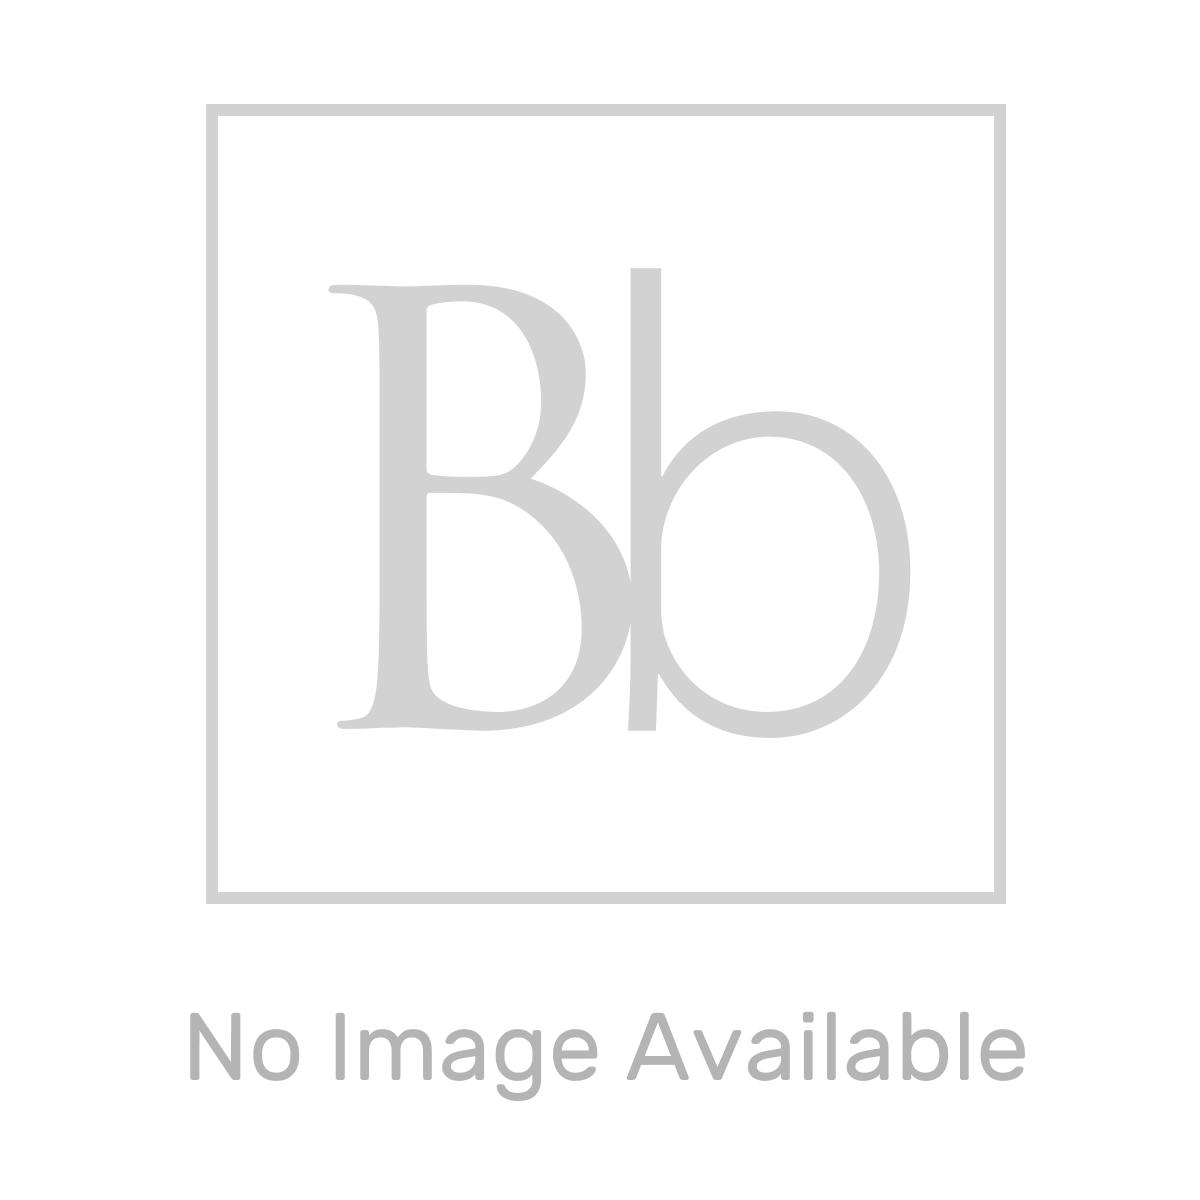 Zenith Emperor Bath Shower Mixer Tap Lifestyle